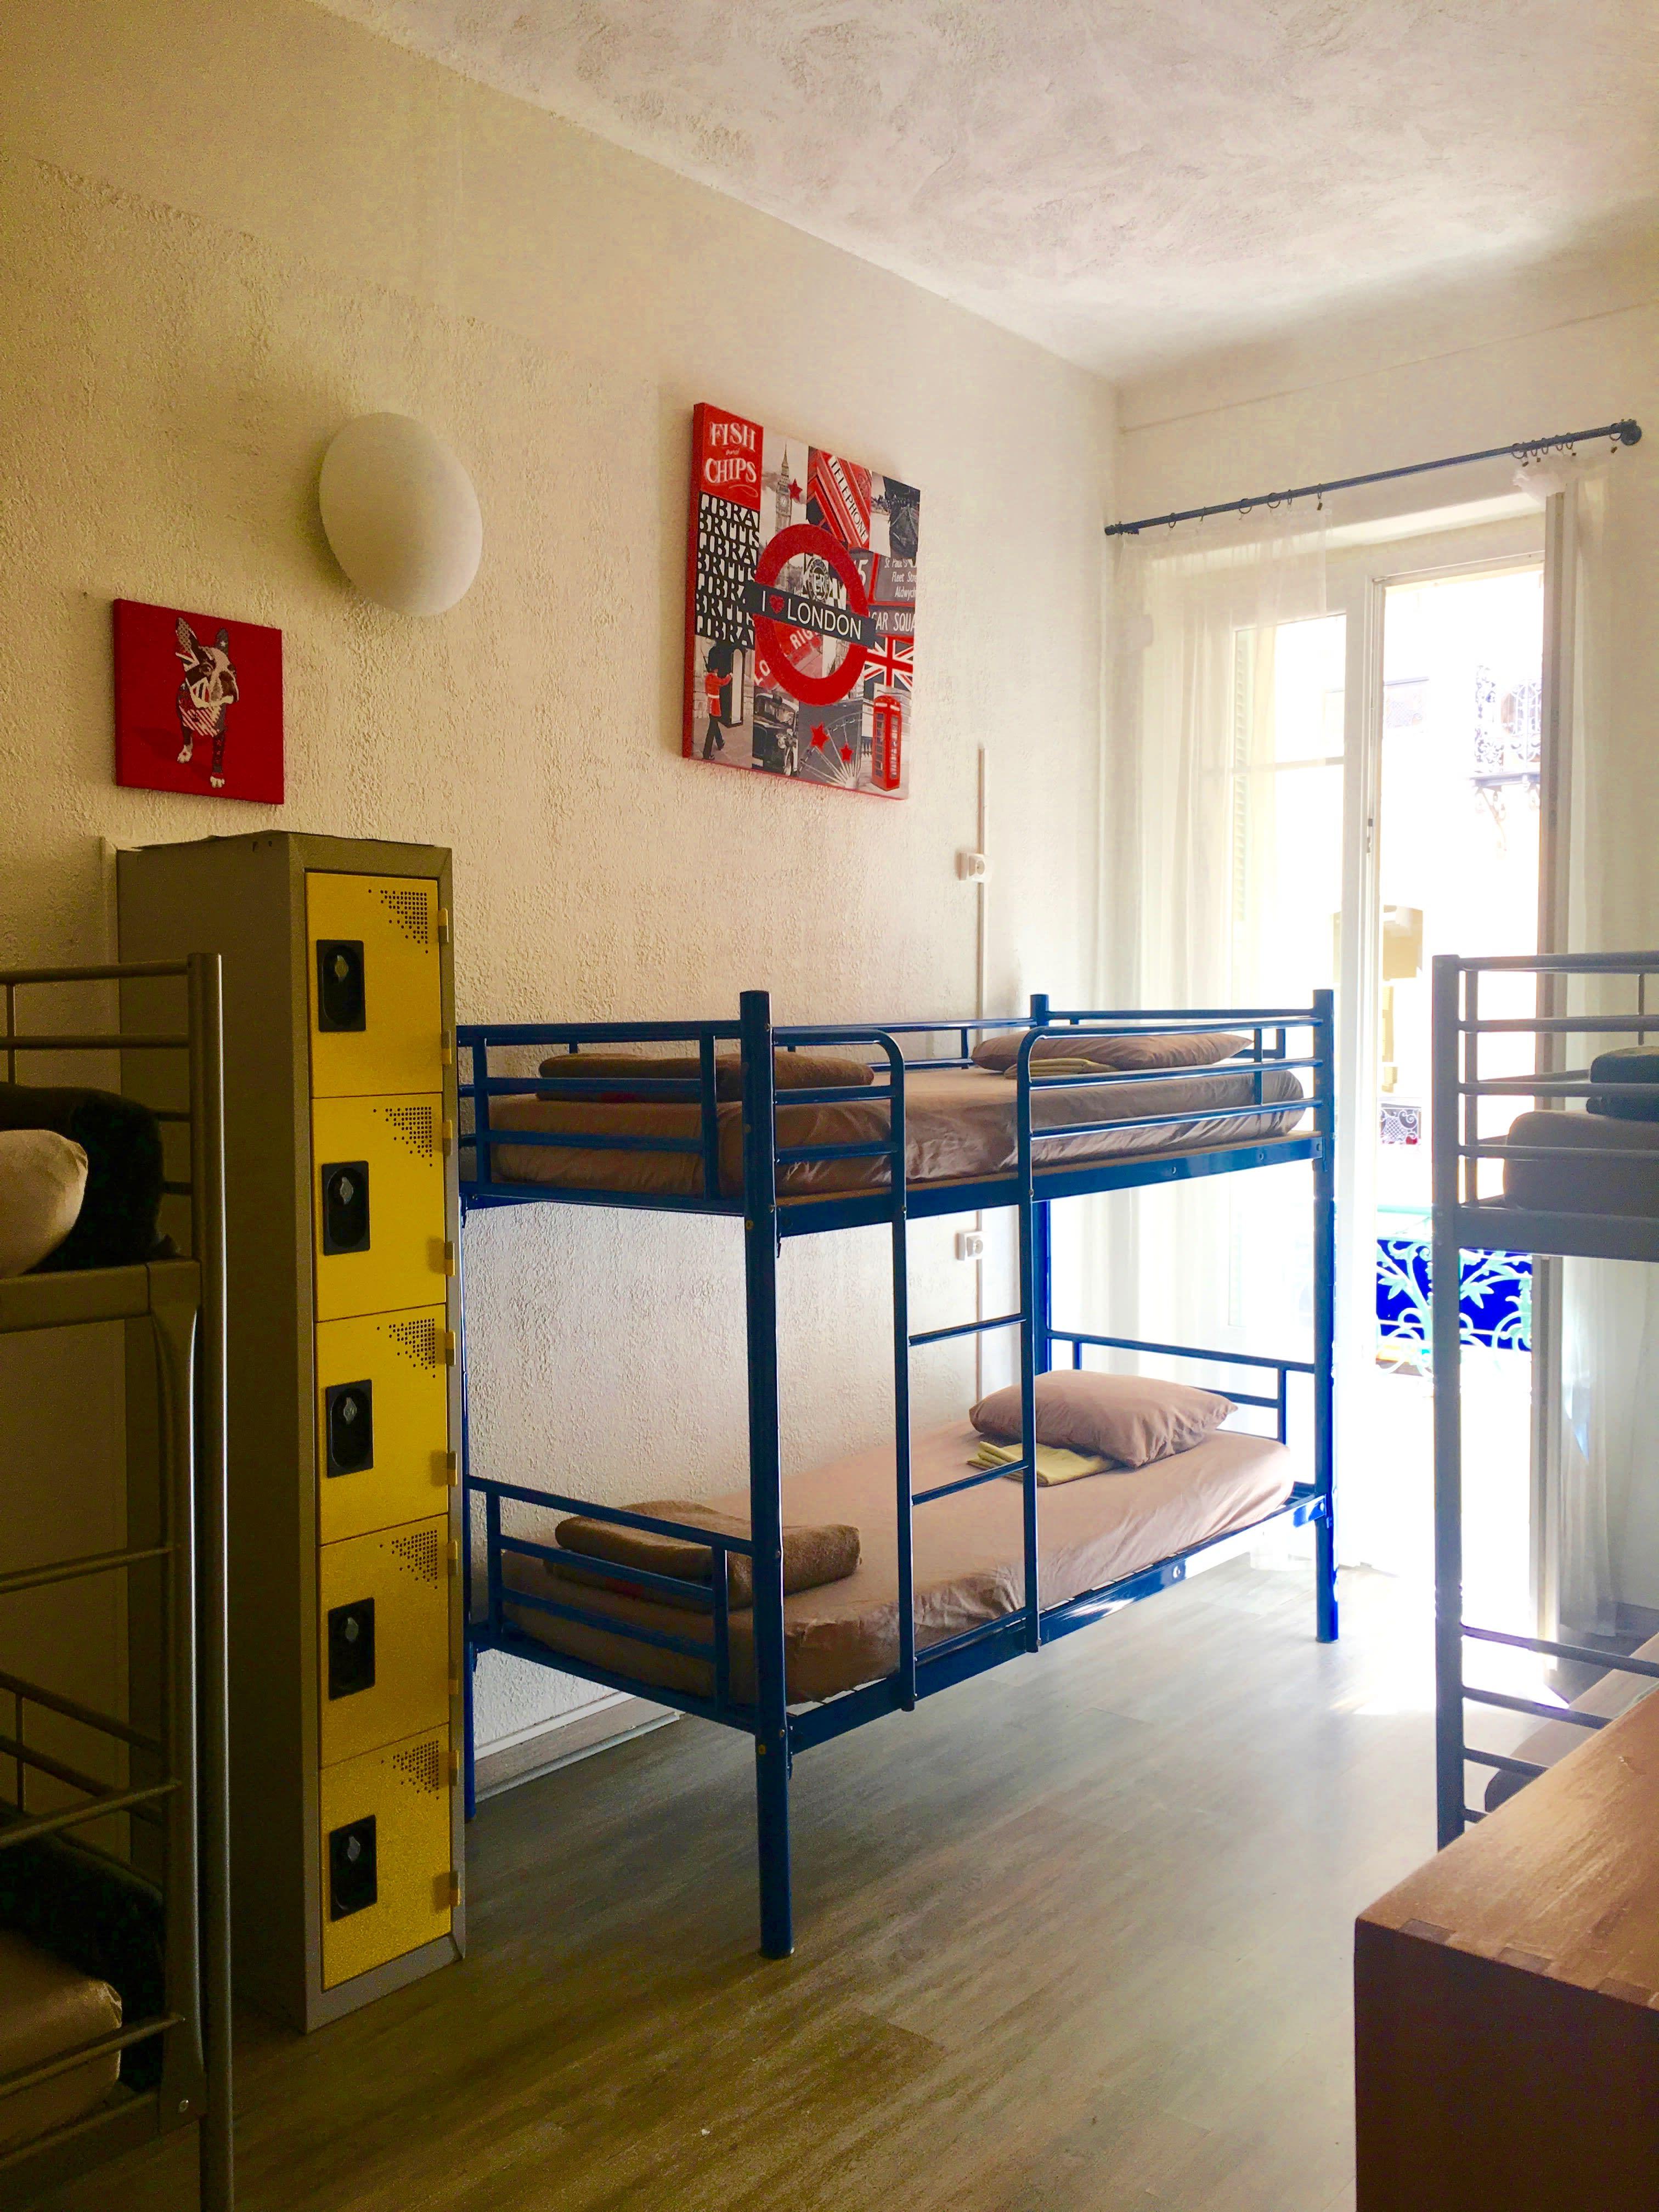 Backpacker's Hostel Chez Patrick